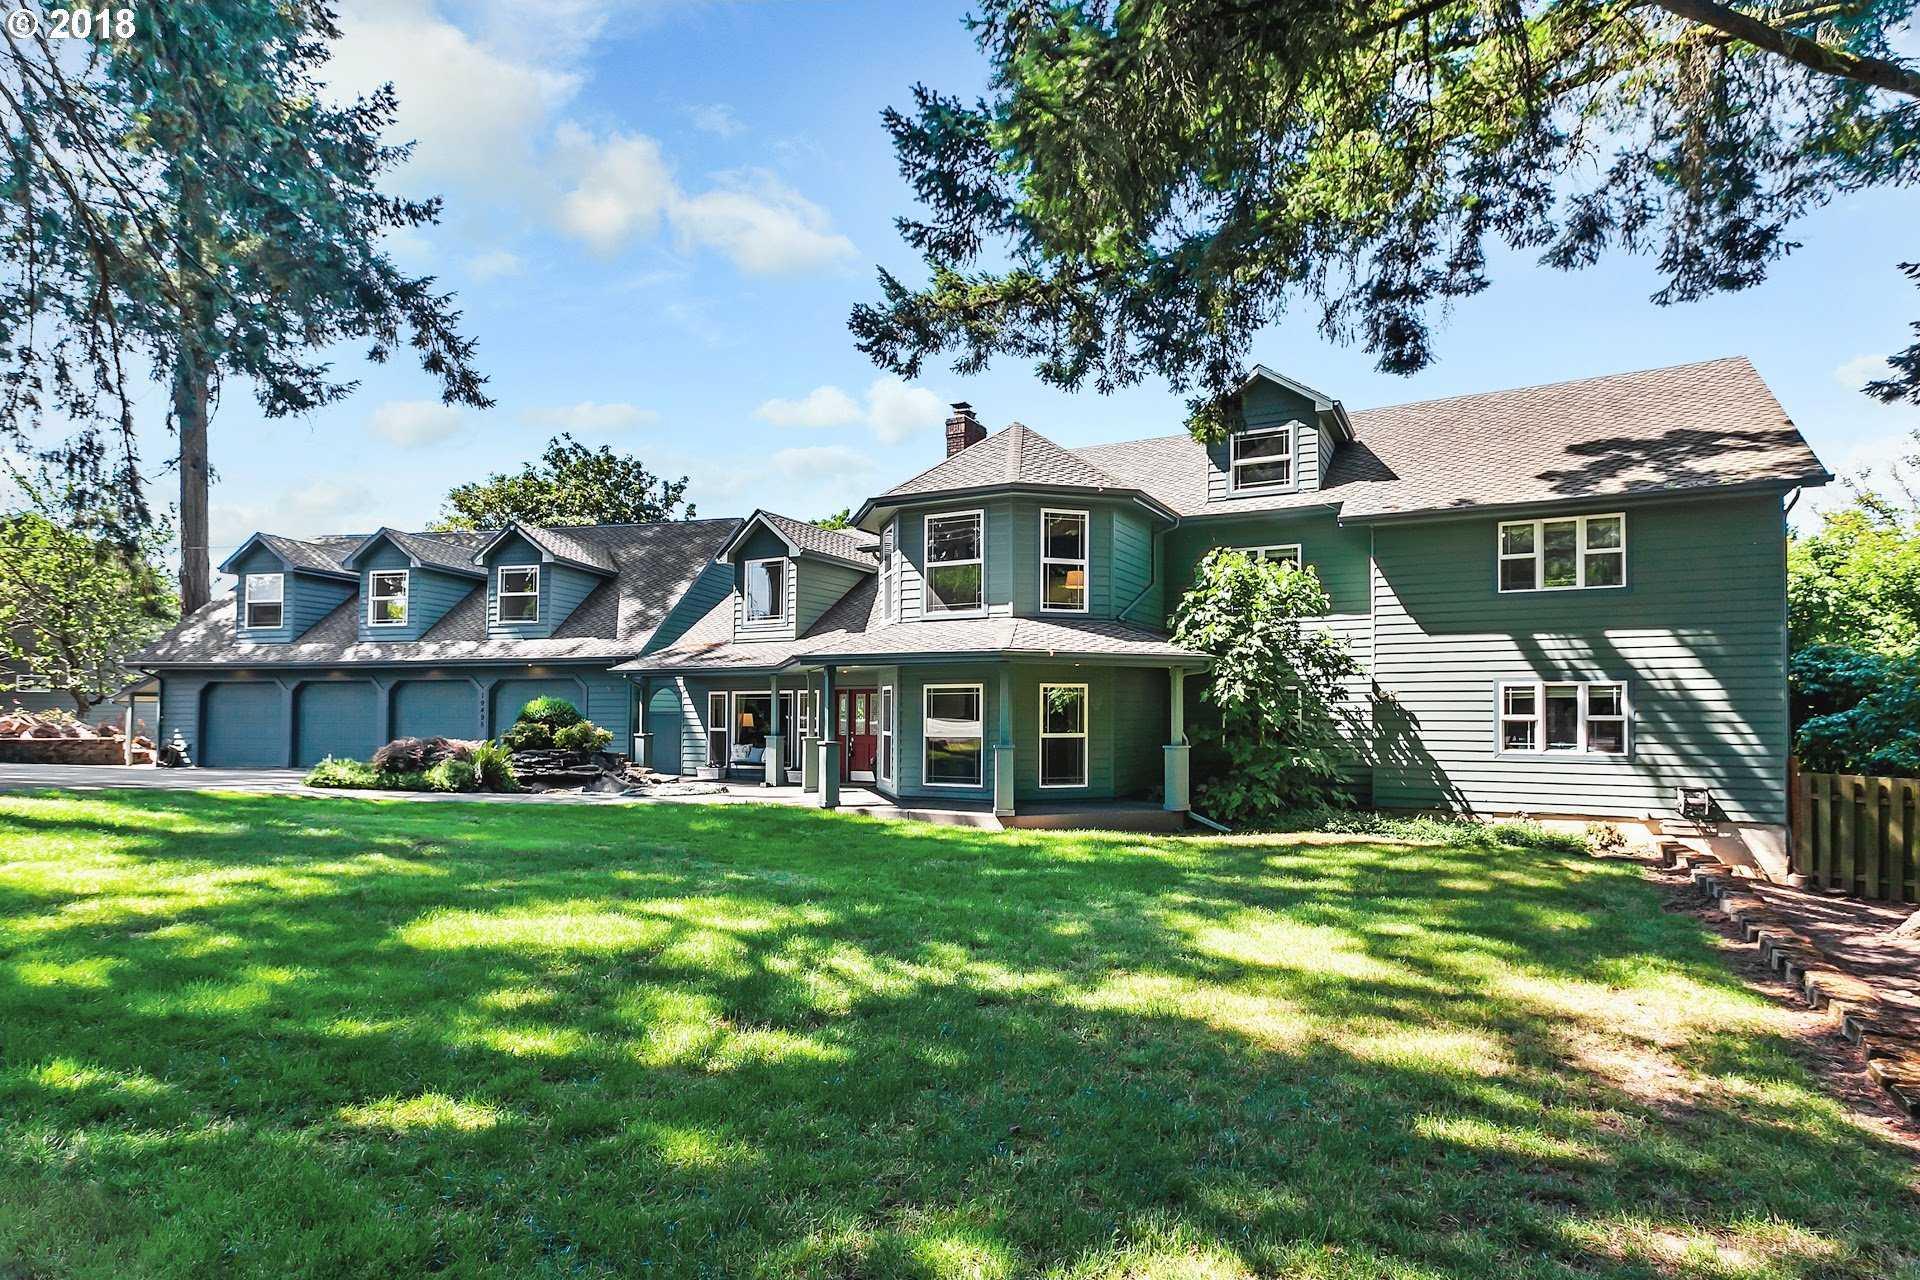 $789,000 - 6Br/5Ba -  for Sale in Beaverton